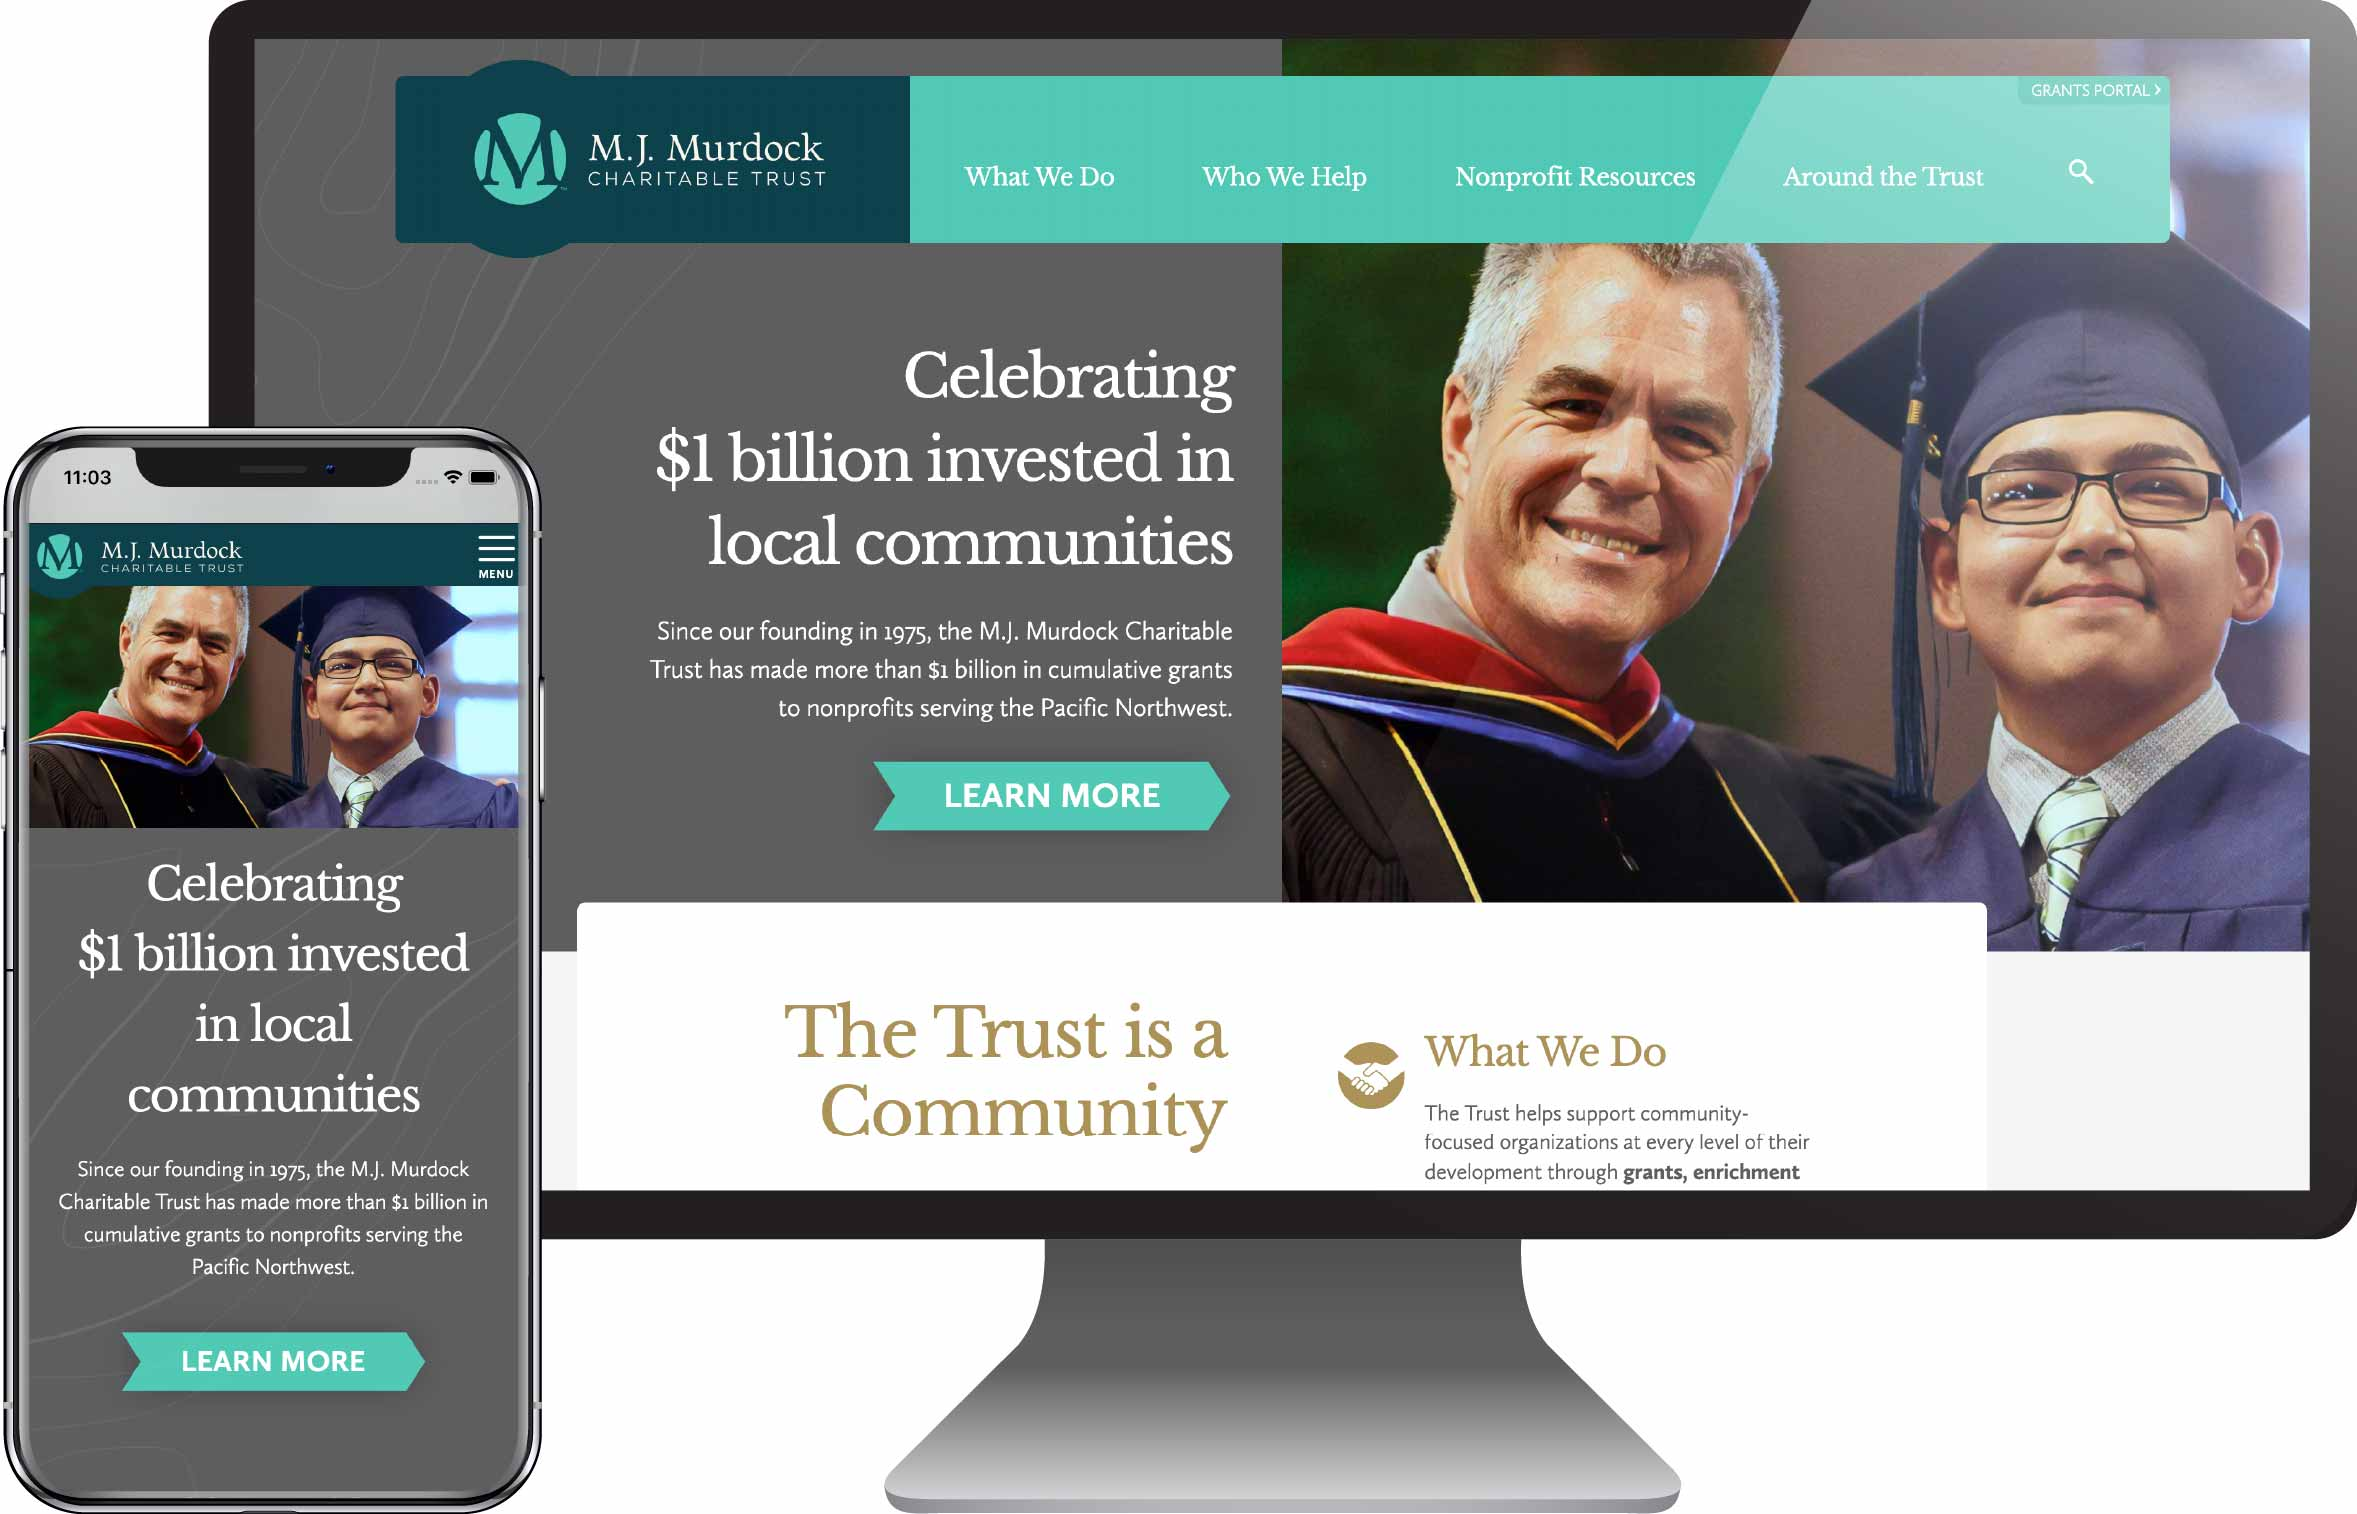 M.J. Murdock Charitable Trust new website design shown on desktop and mobile views